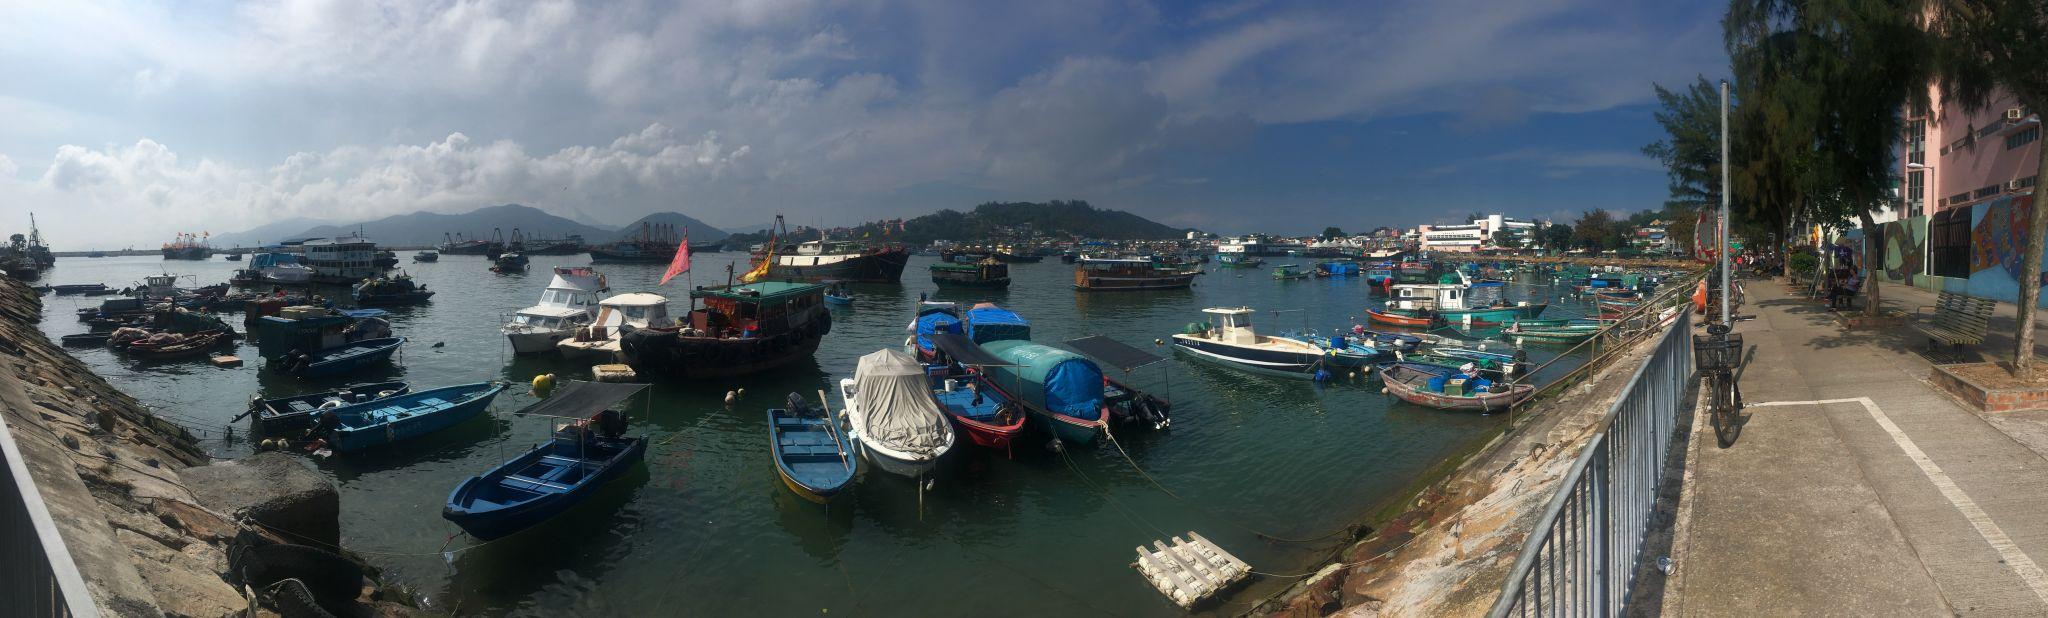 Hong Kong: A Foodie's Dream